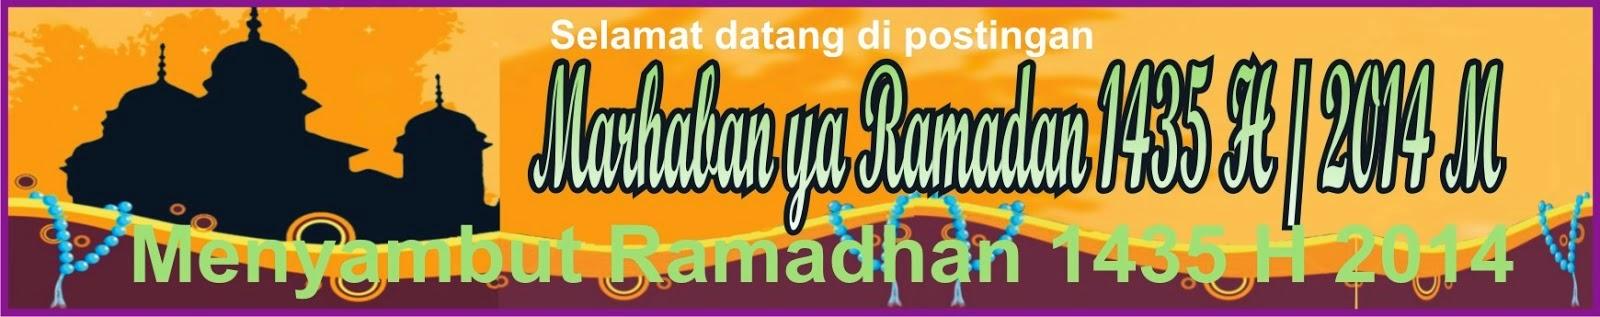 Marhaban ya Ramadan 1435 H / 2014 M : Menyambut Ramadhan 1435 H / 2014 M